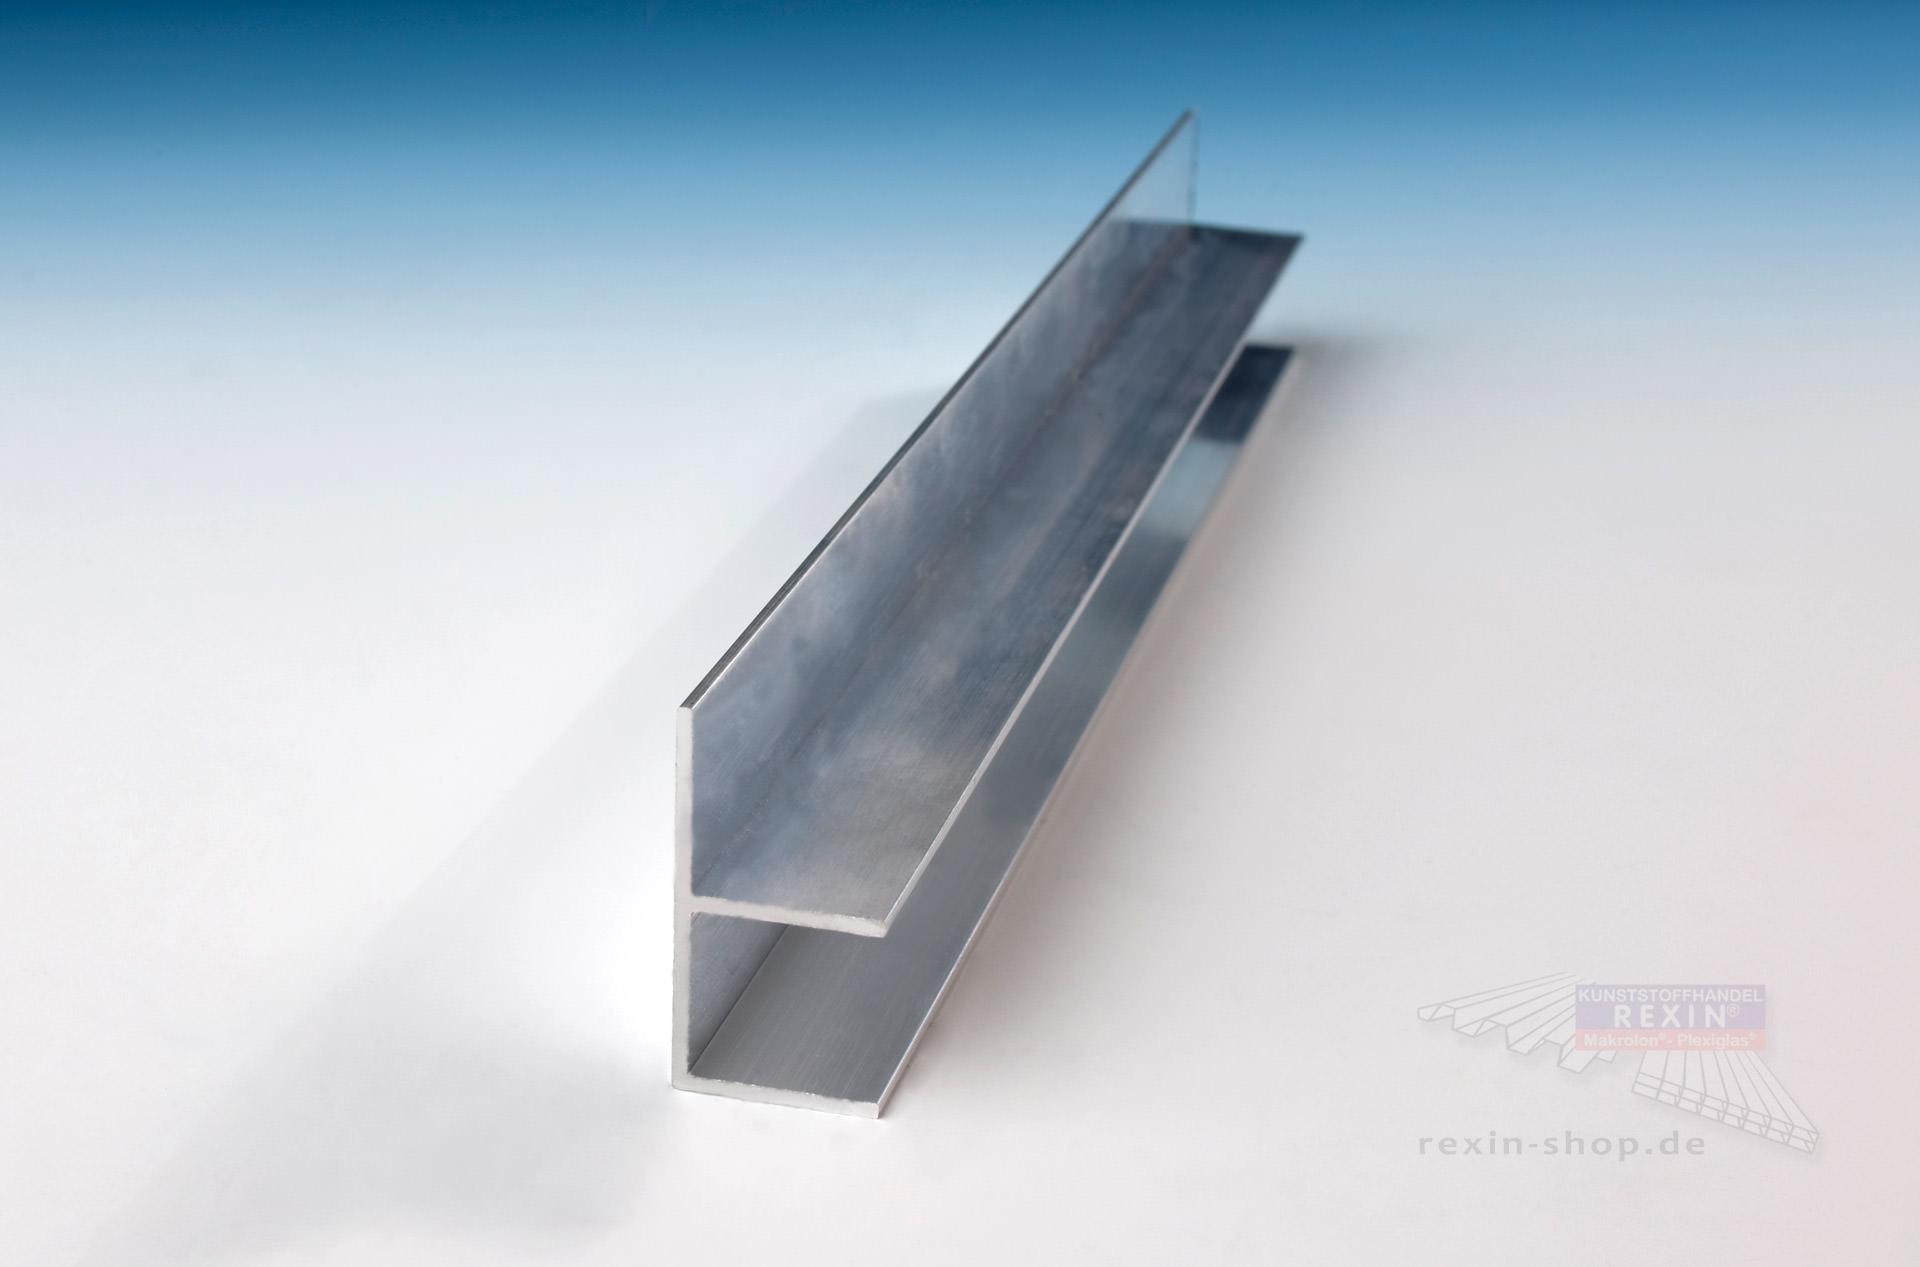 terrassenuberdachung holz mit vsg 8mm glas. Black Bedroom Furniture Sets. Home Design Ideas